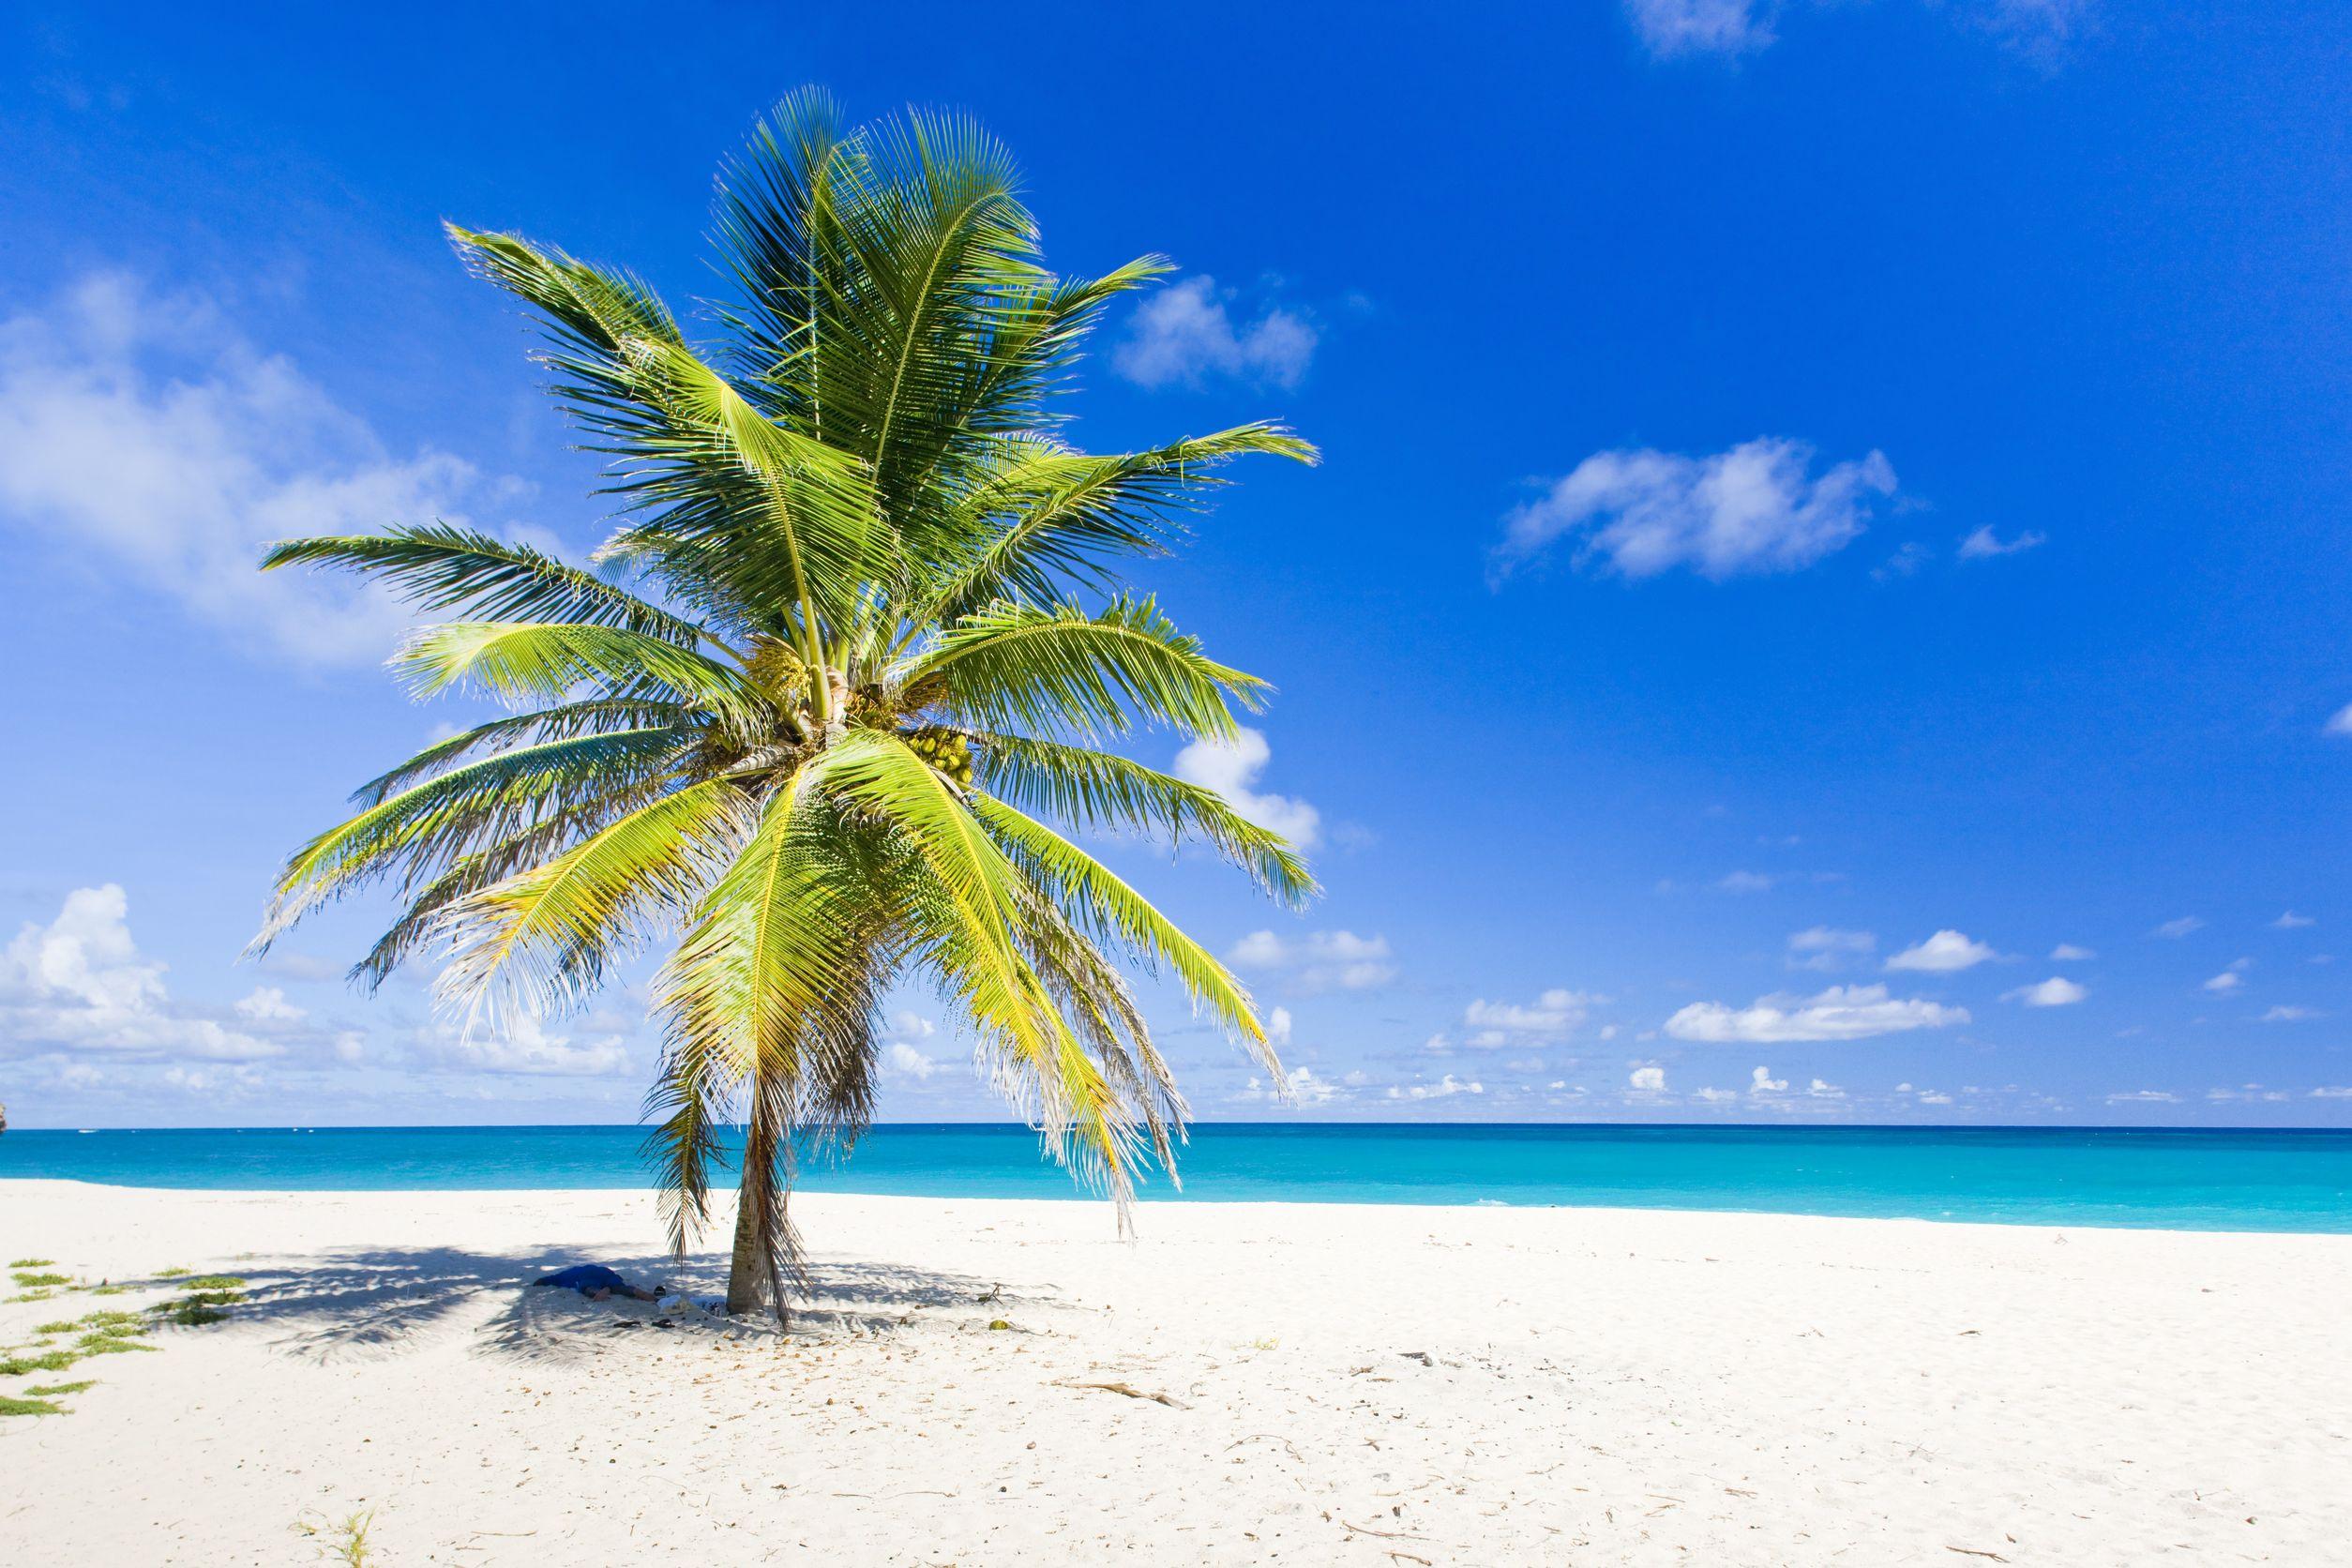 caribbean palm tree 123rf